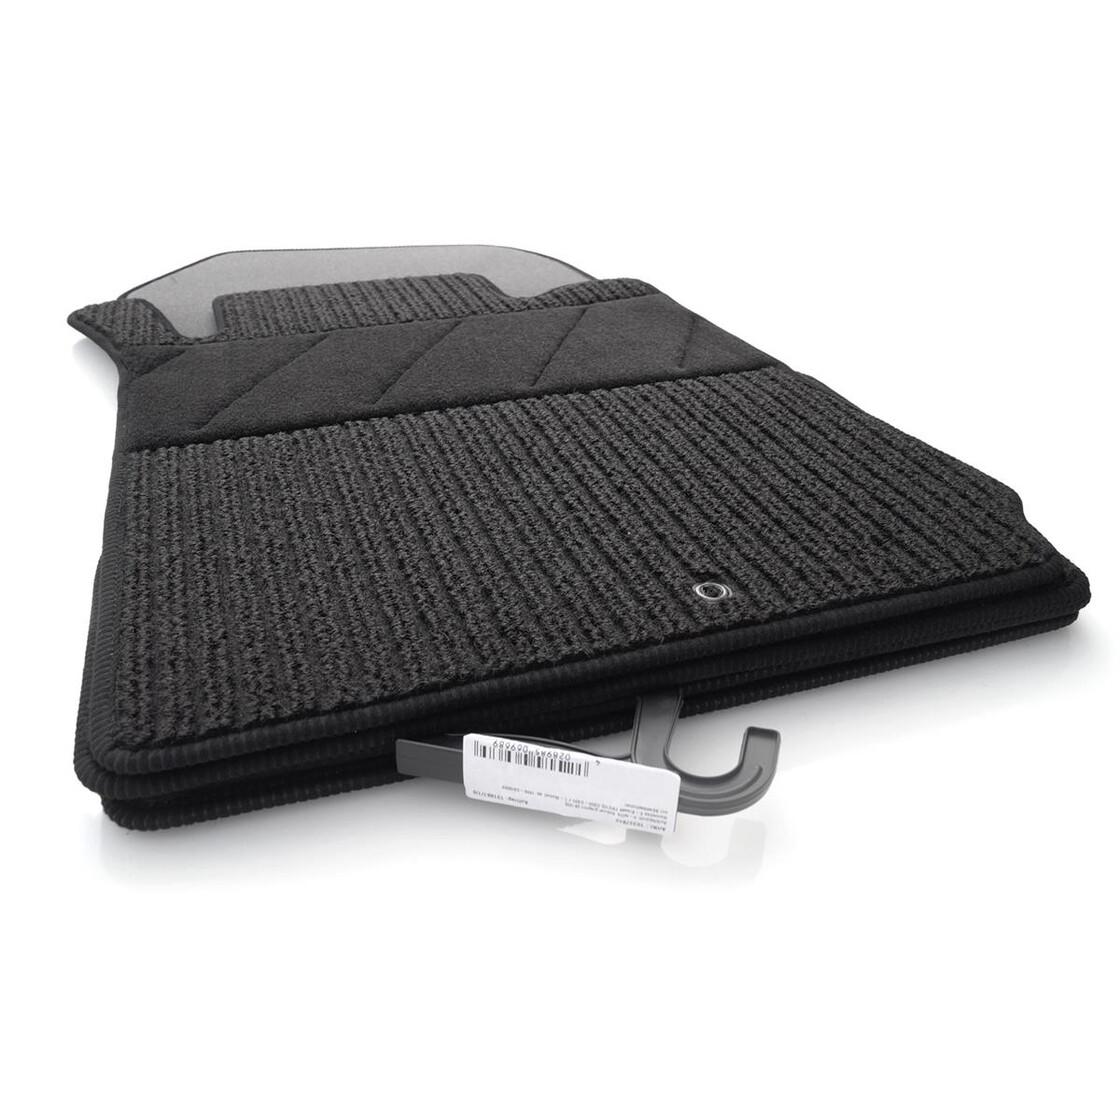 mercedes ripsmatten e klasse w210 s210 original rips auto fu matten schwarz. Black Bedroom Furniture Sets. Home Design Ideas